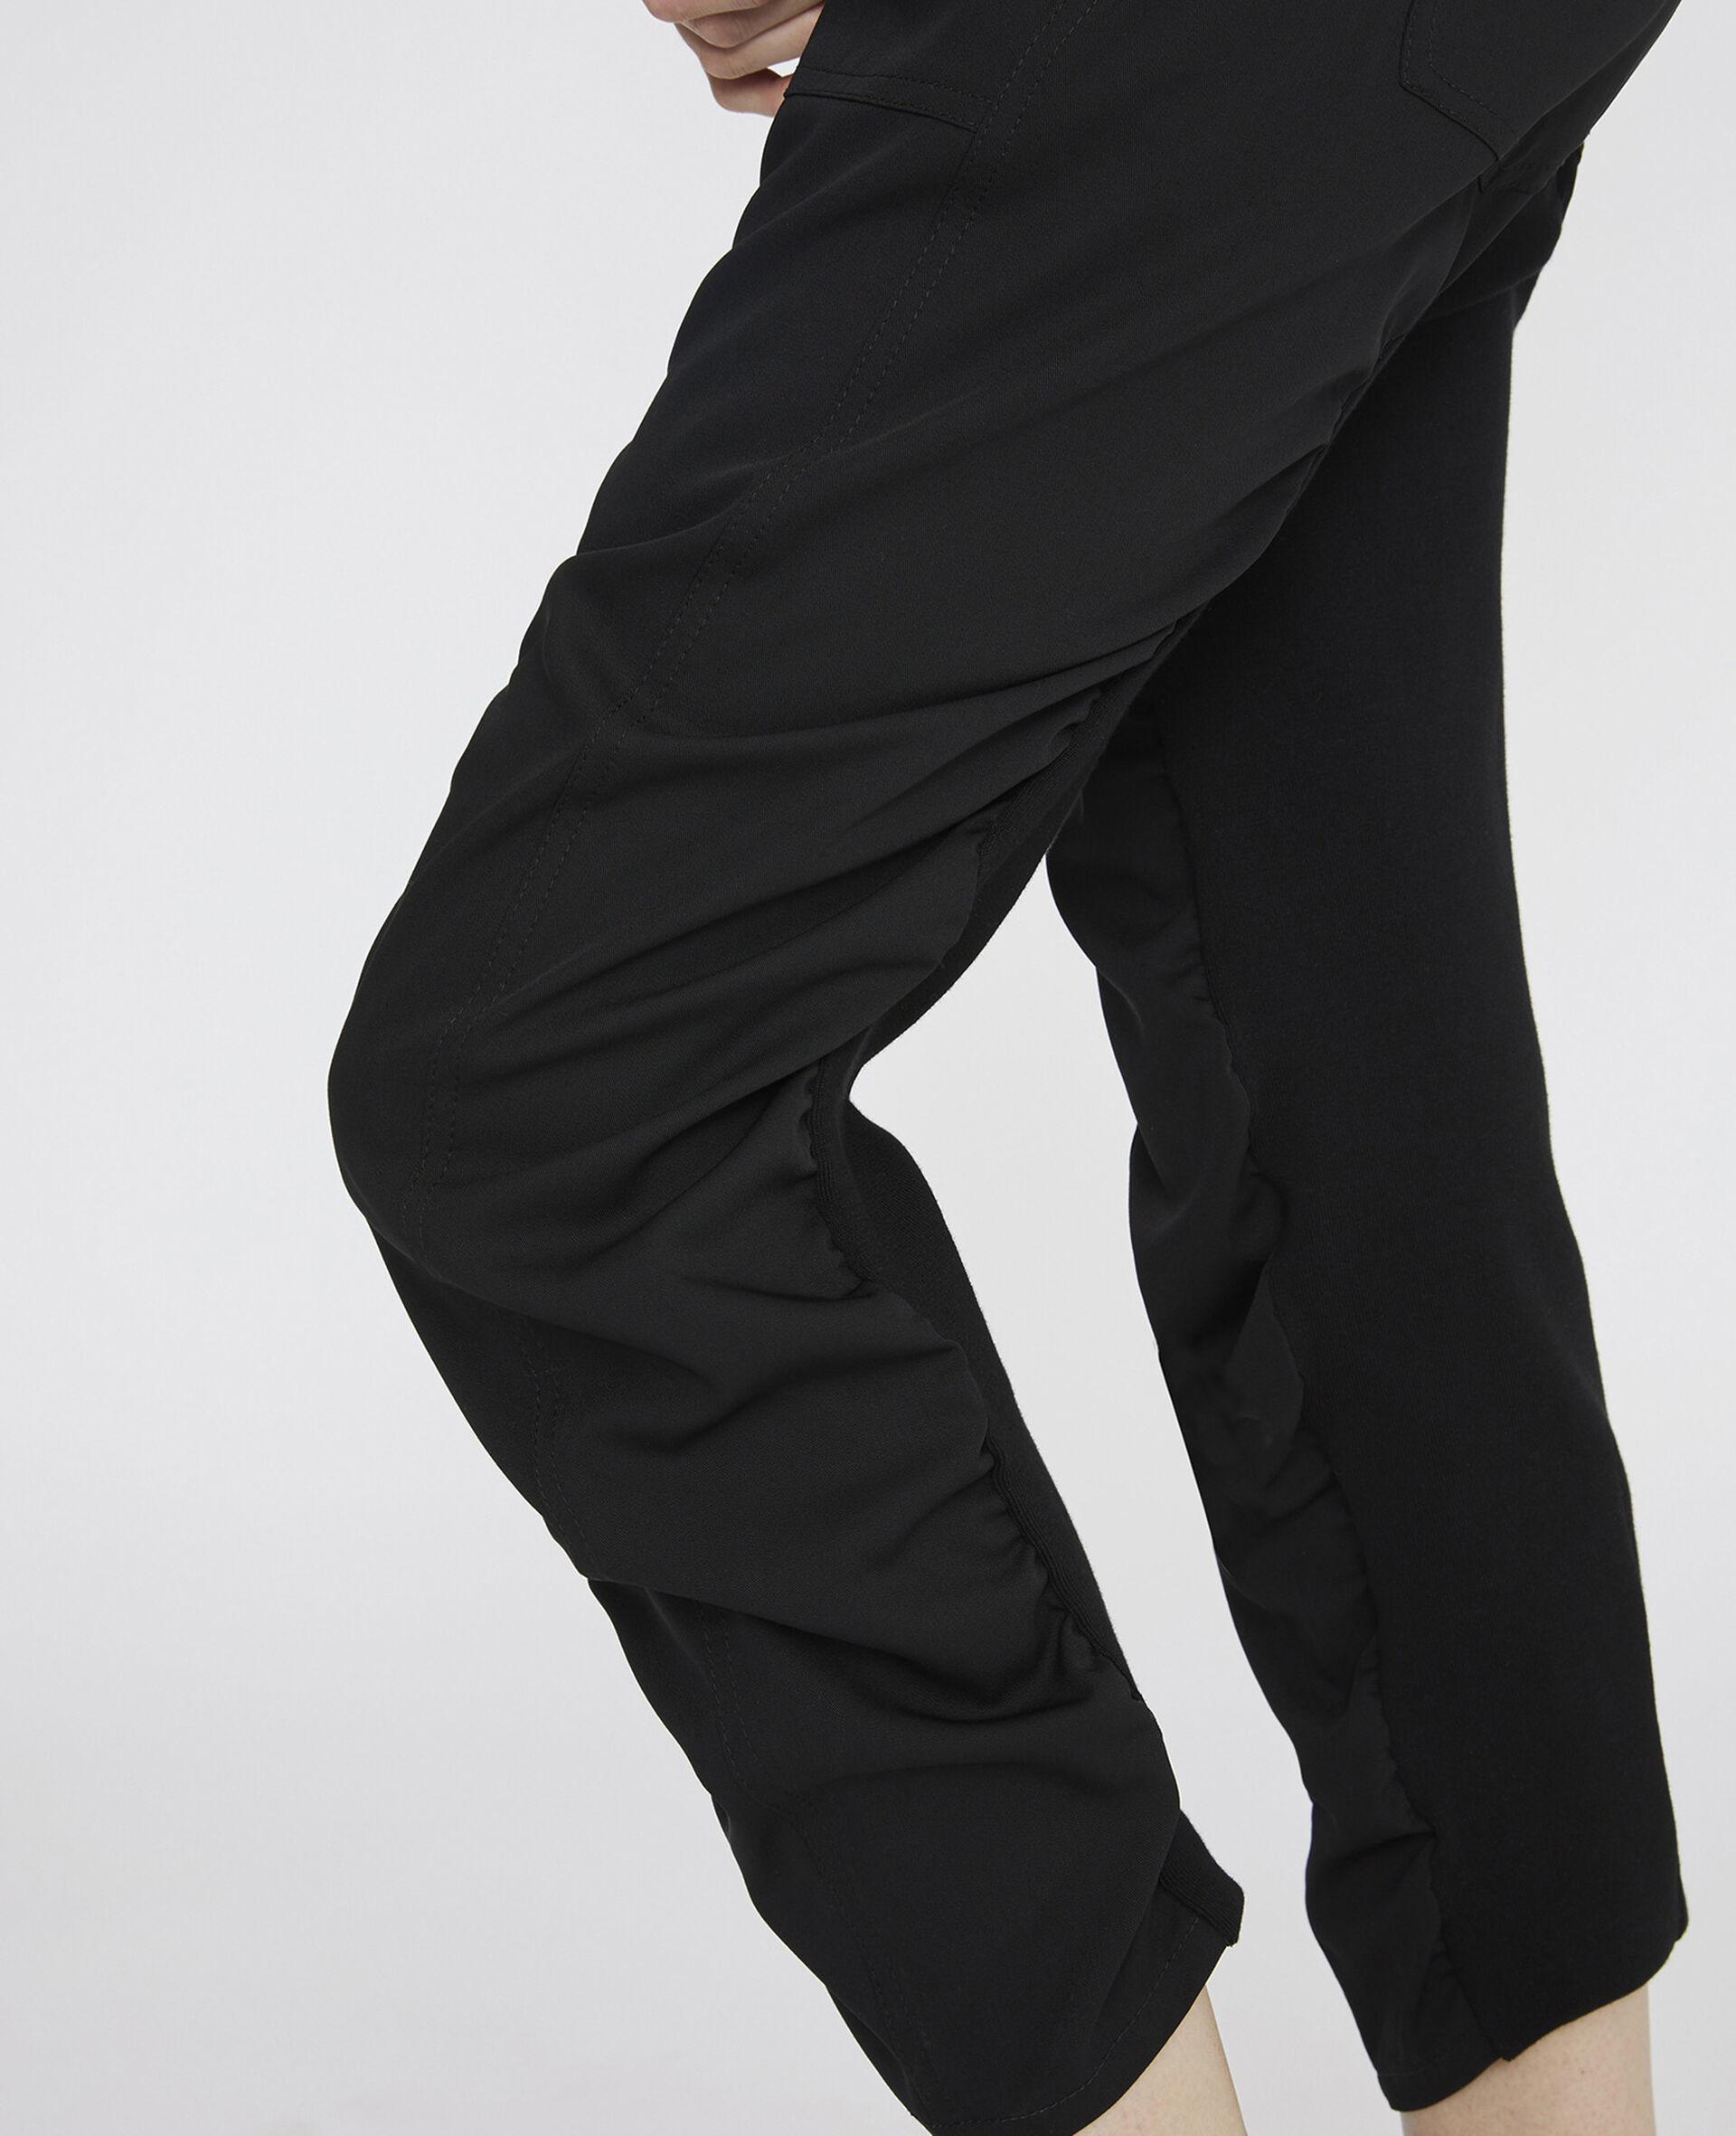 Pantaloni Tina Neri-Nero-large image number 3